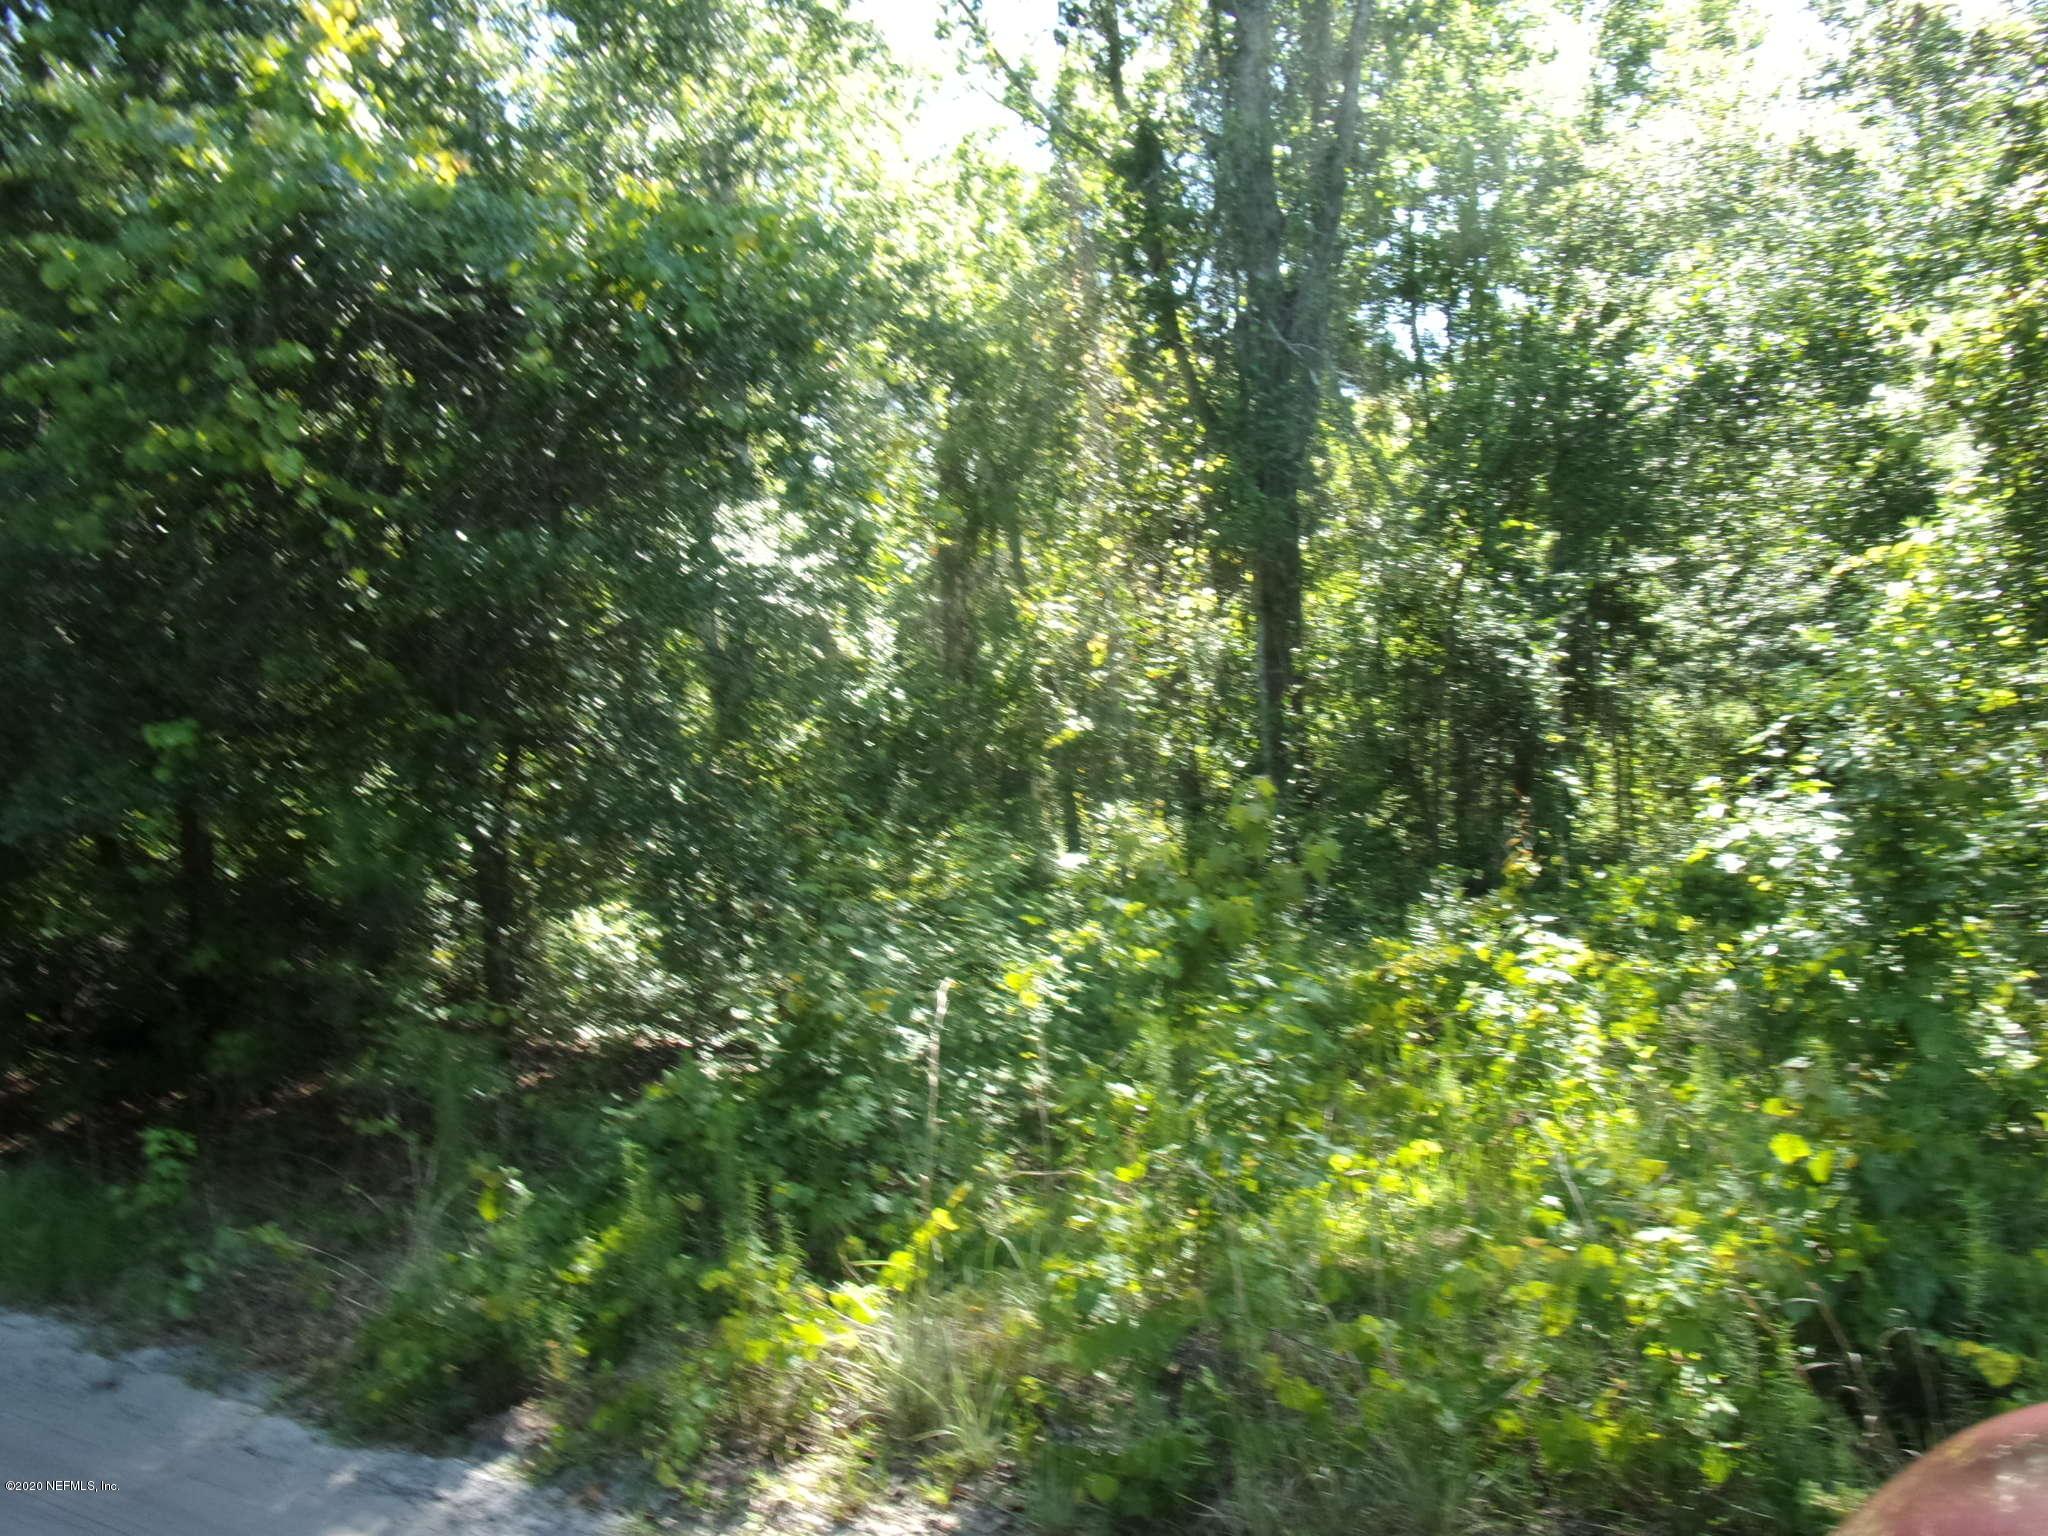 TBD MOCCASIN CREEK, PALATKA, FLORIDA 32177, ,Vacant land,For sale,MOCCASIN CREEK,827369